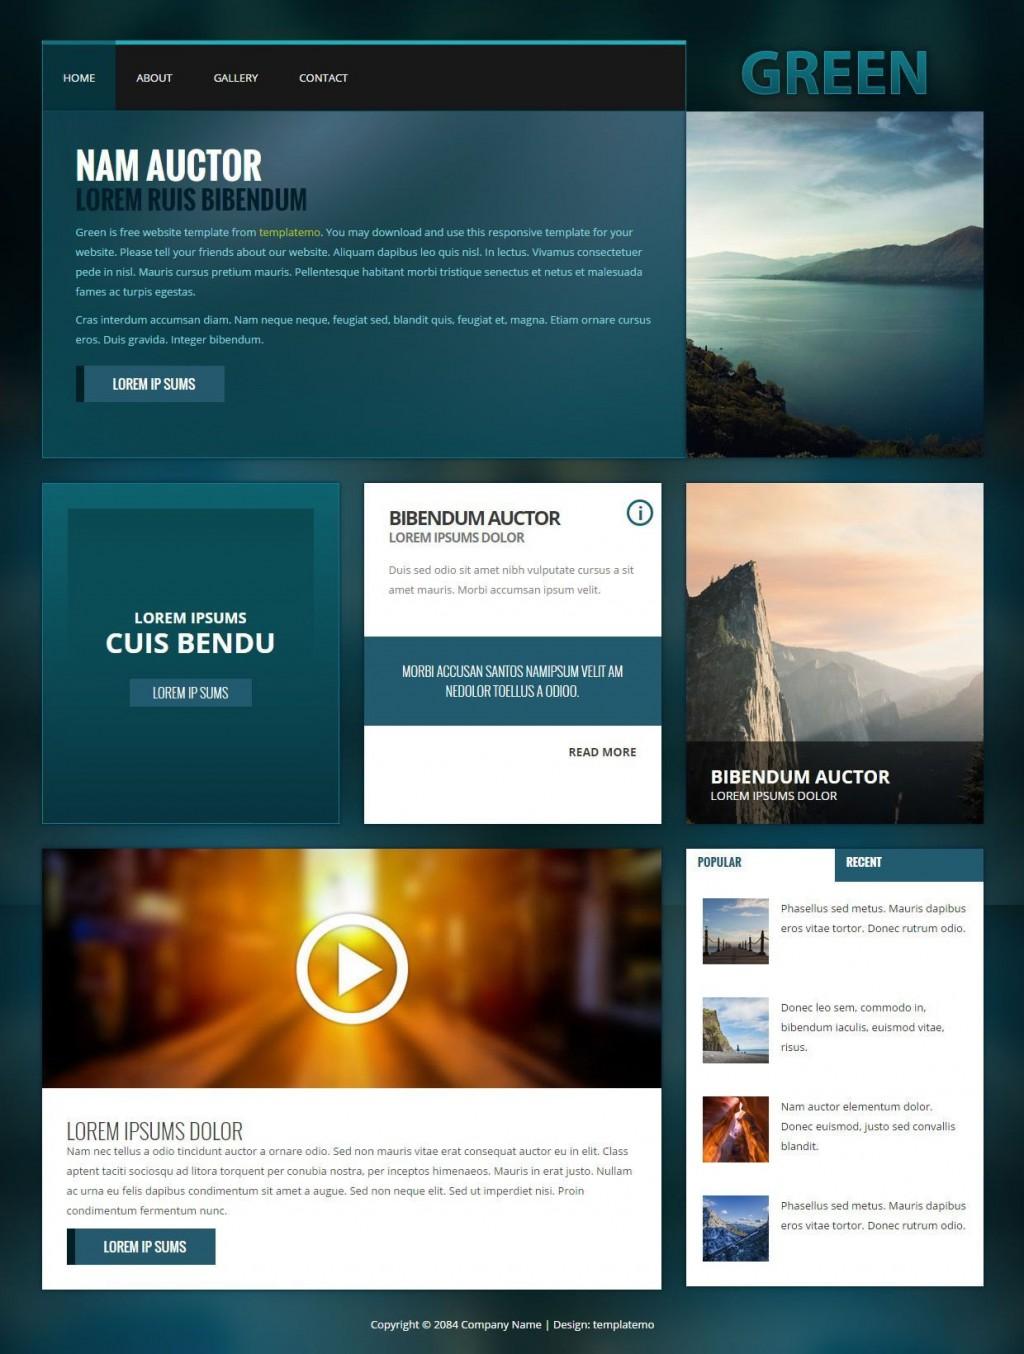 001 Striking Web Page Design Template Cs Image  CssLarge